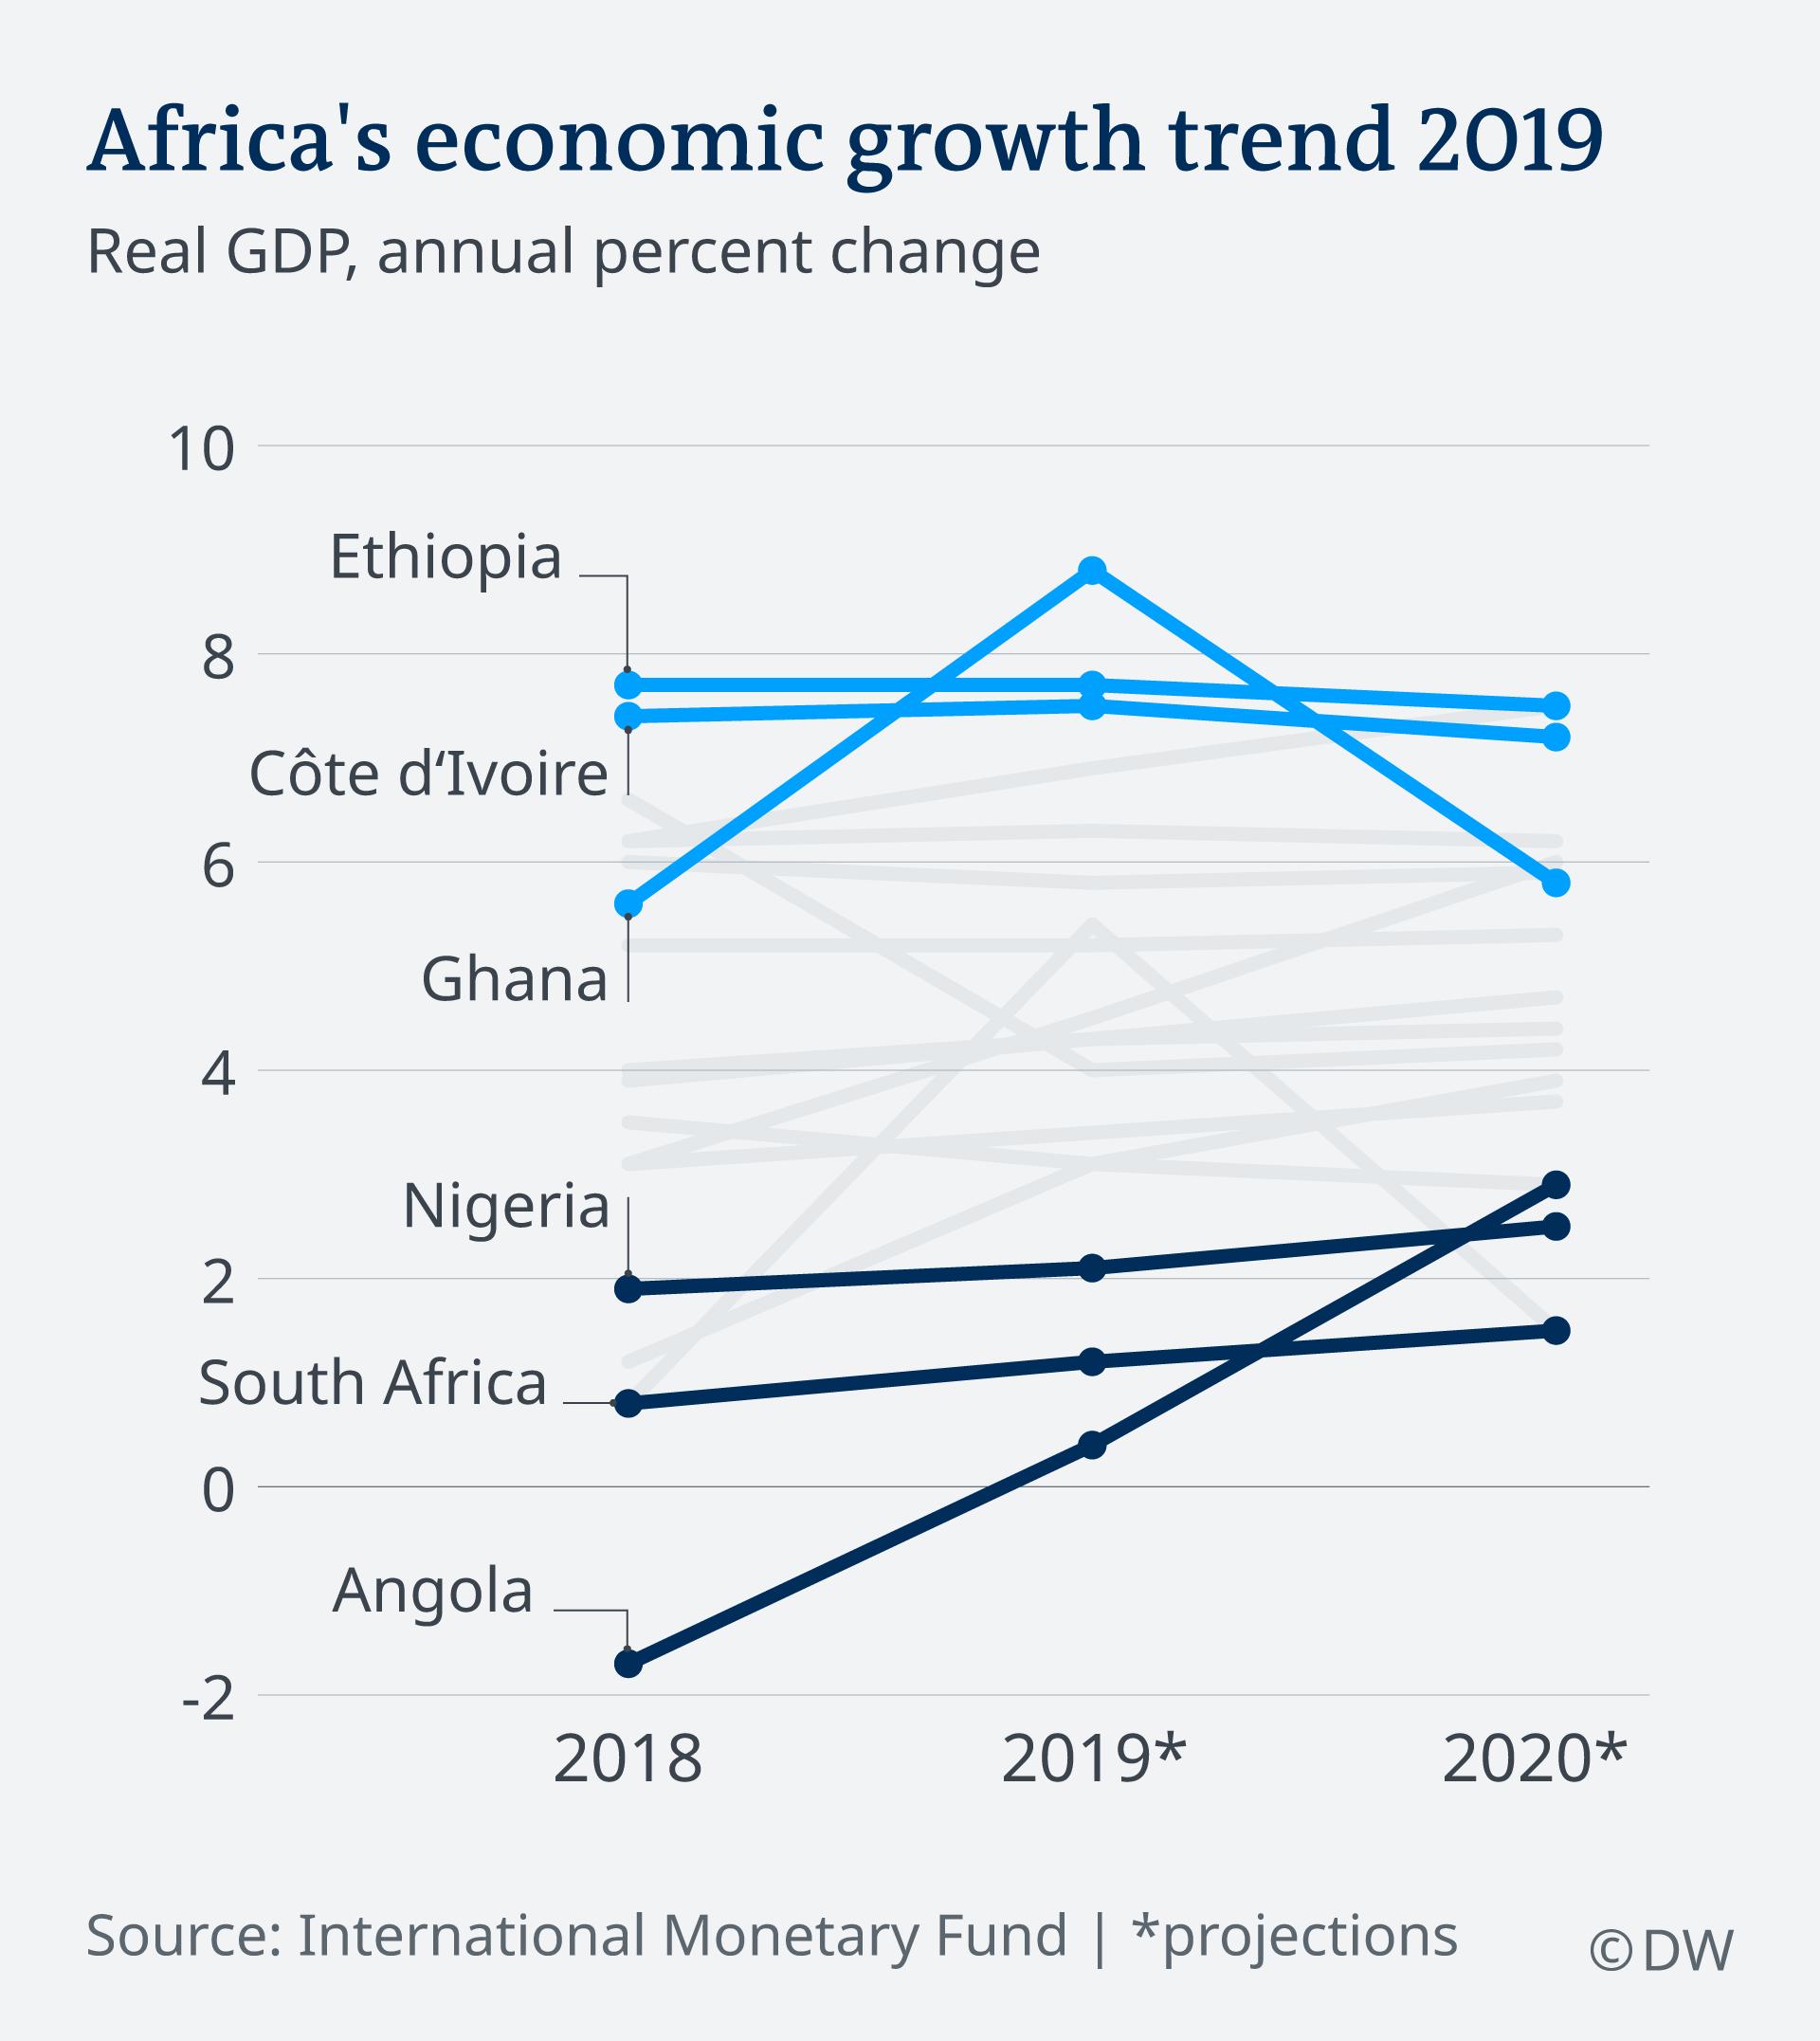 Africa's economic growth trend 2019